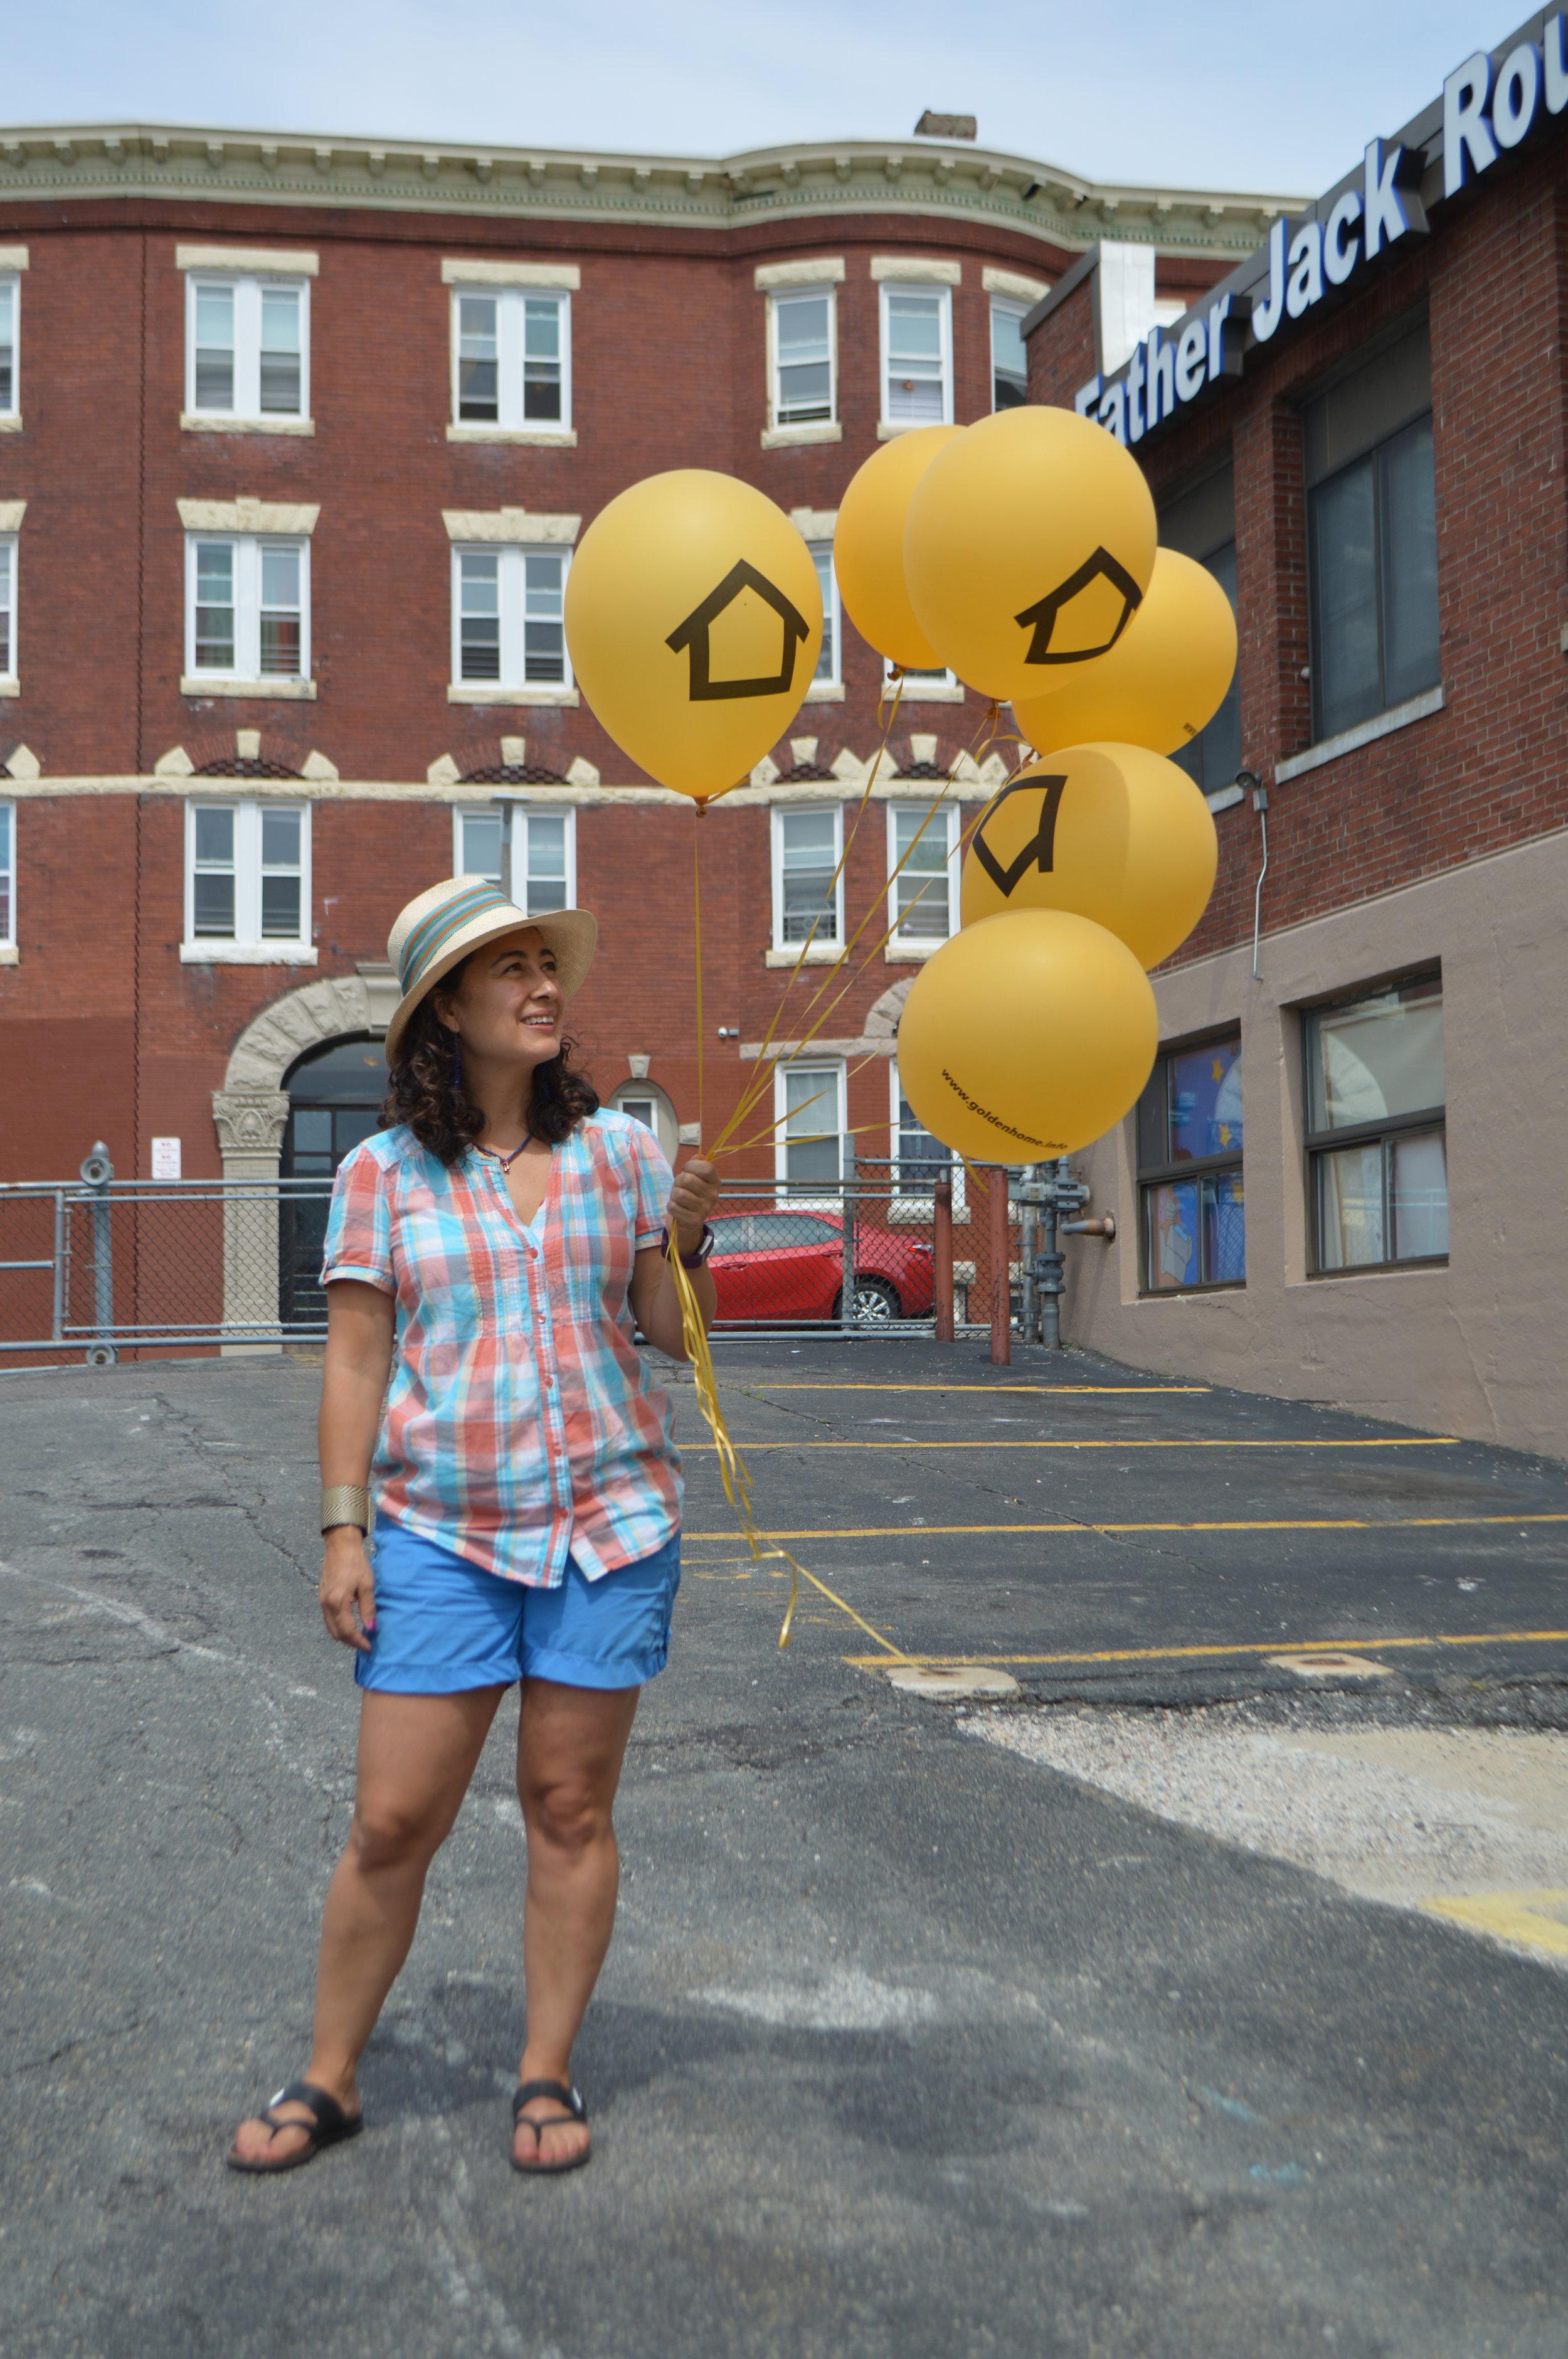 Lina and the  Golden Home  balloons. Photo credit Lina Maria Giraldo.